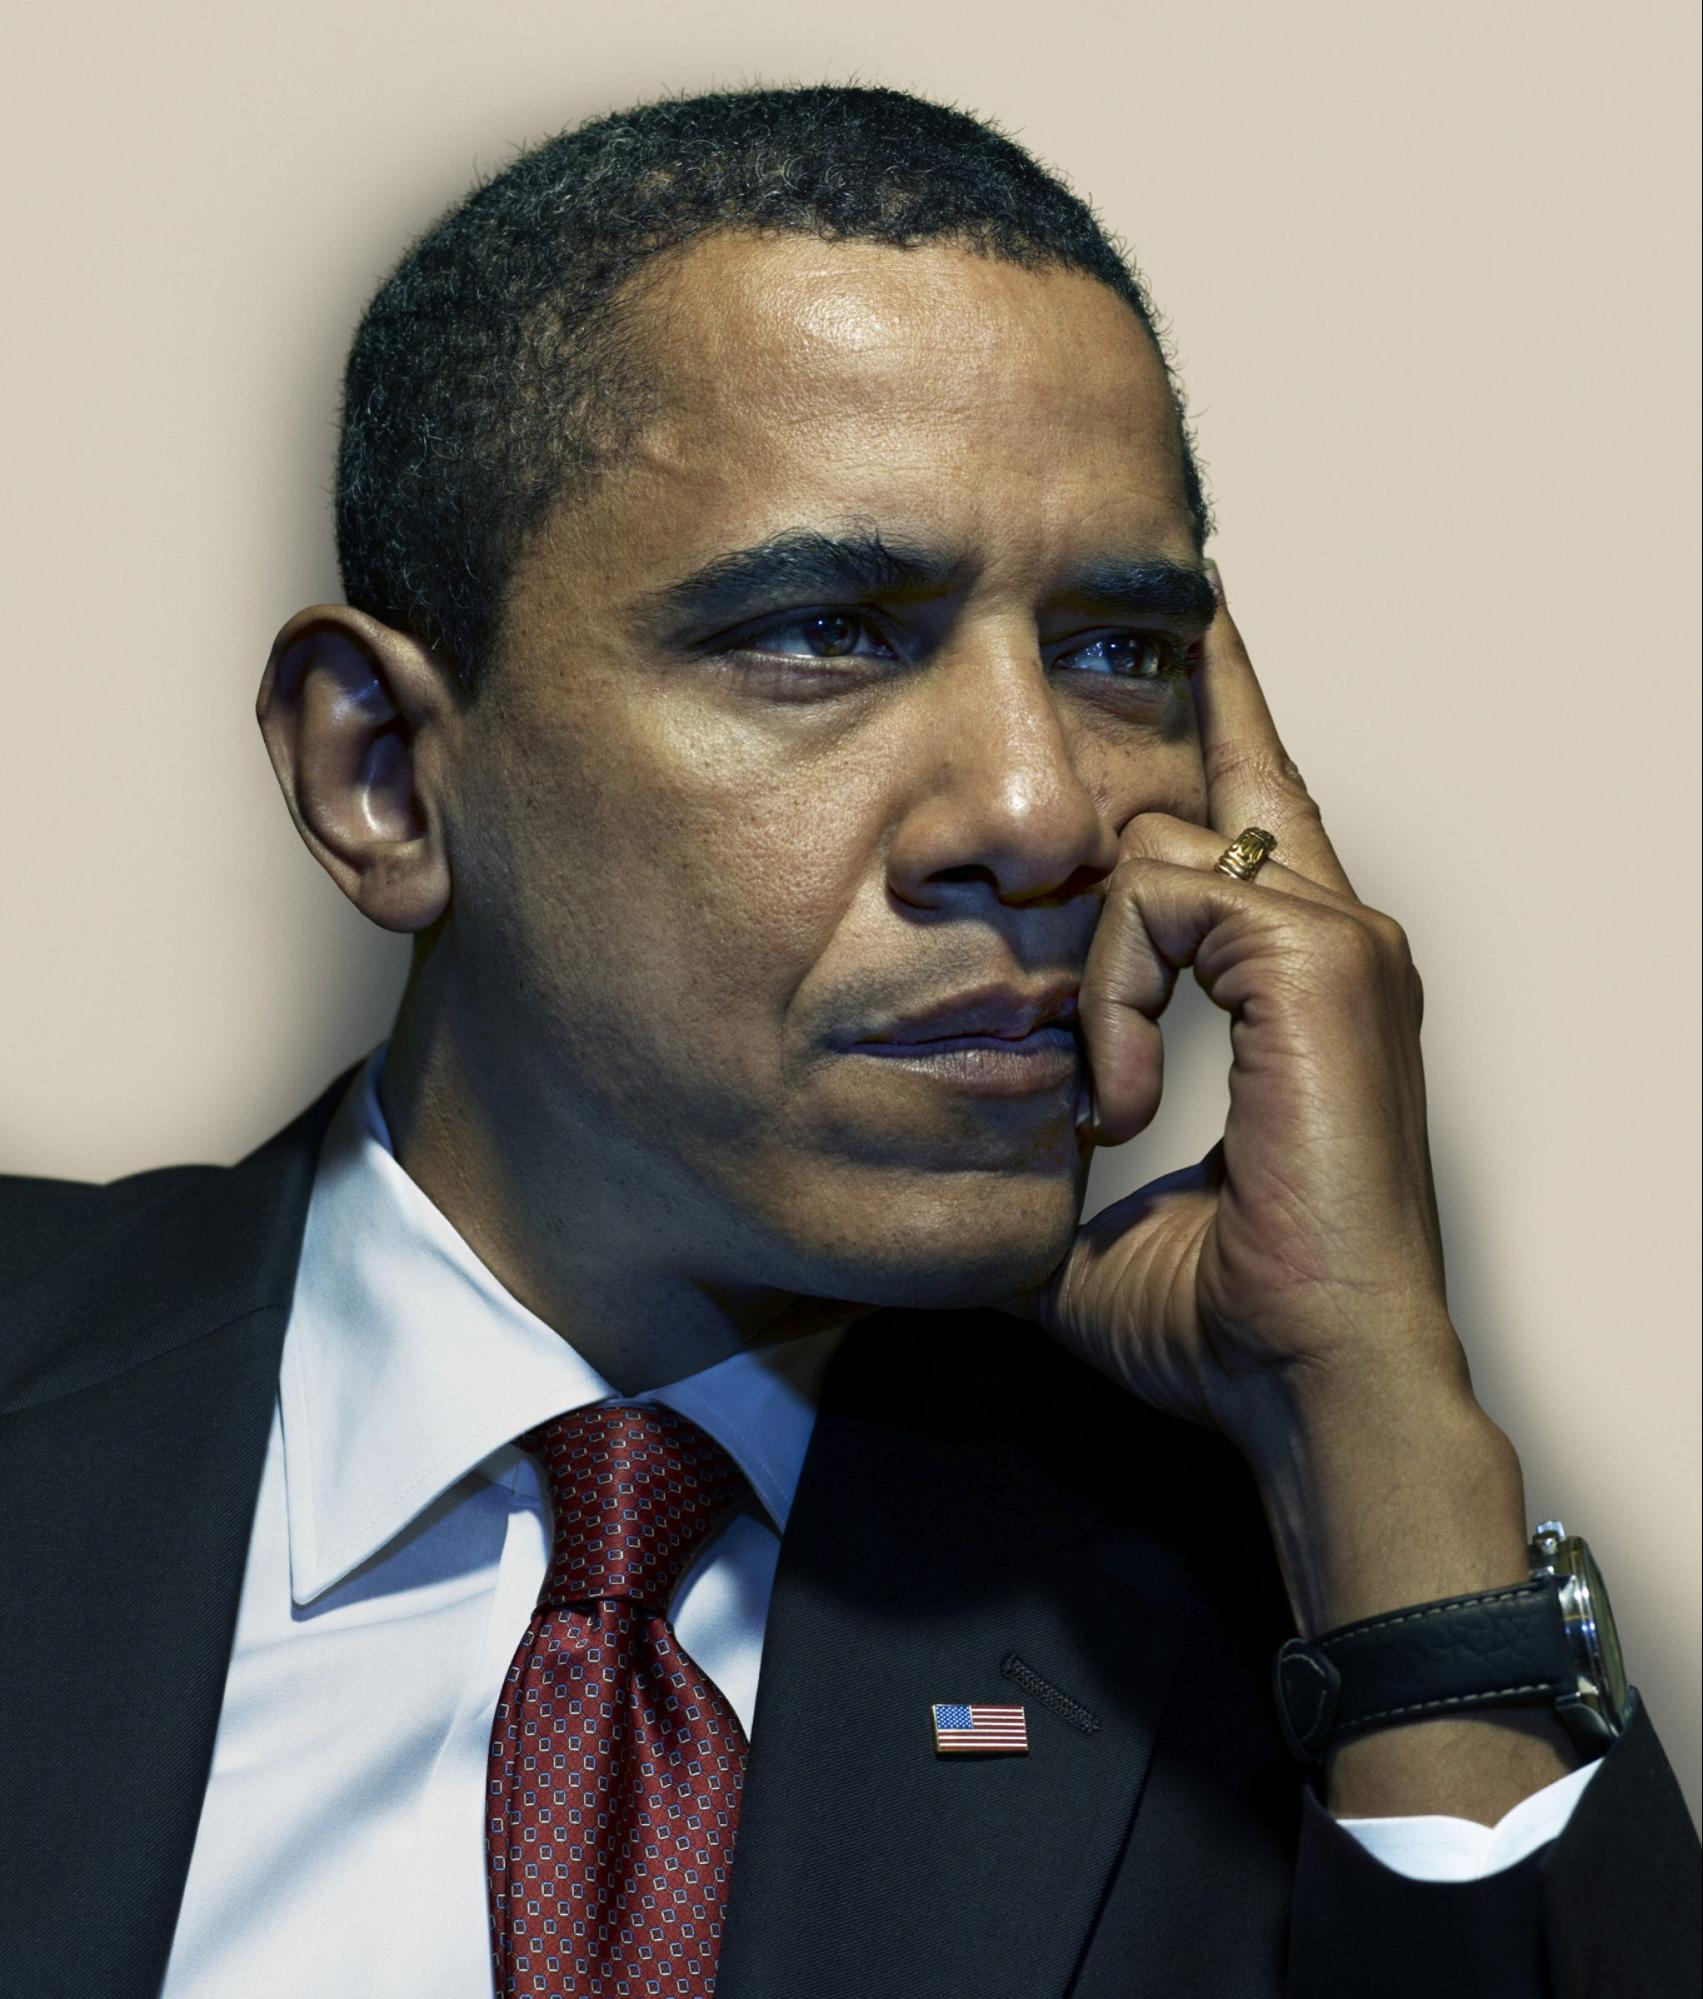 Barack Obama, 2009 photograph by Nadav Kander